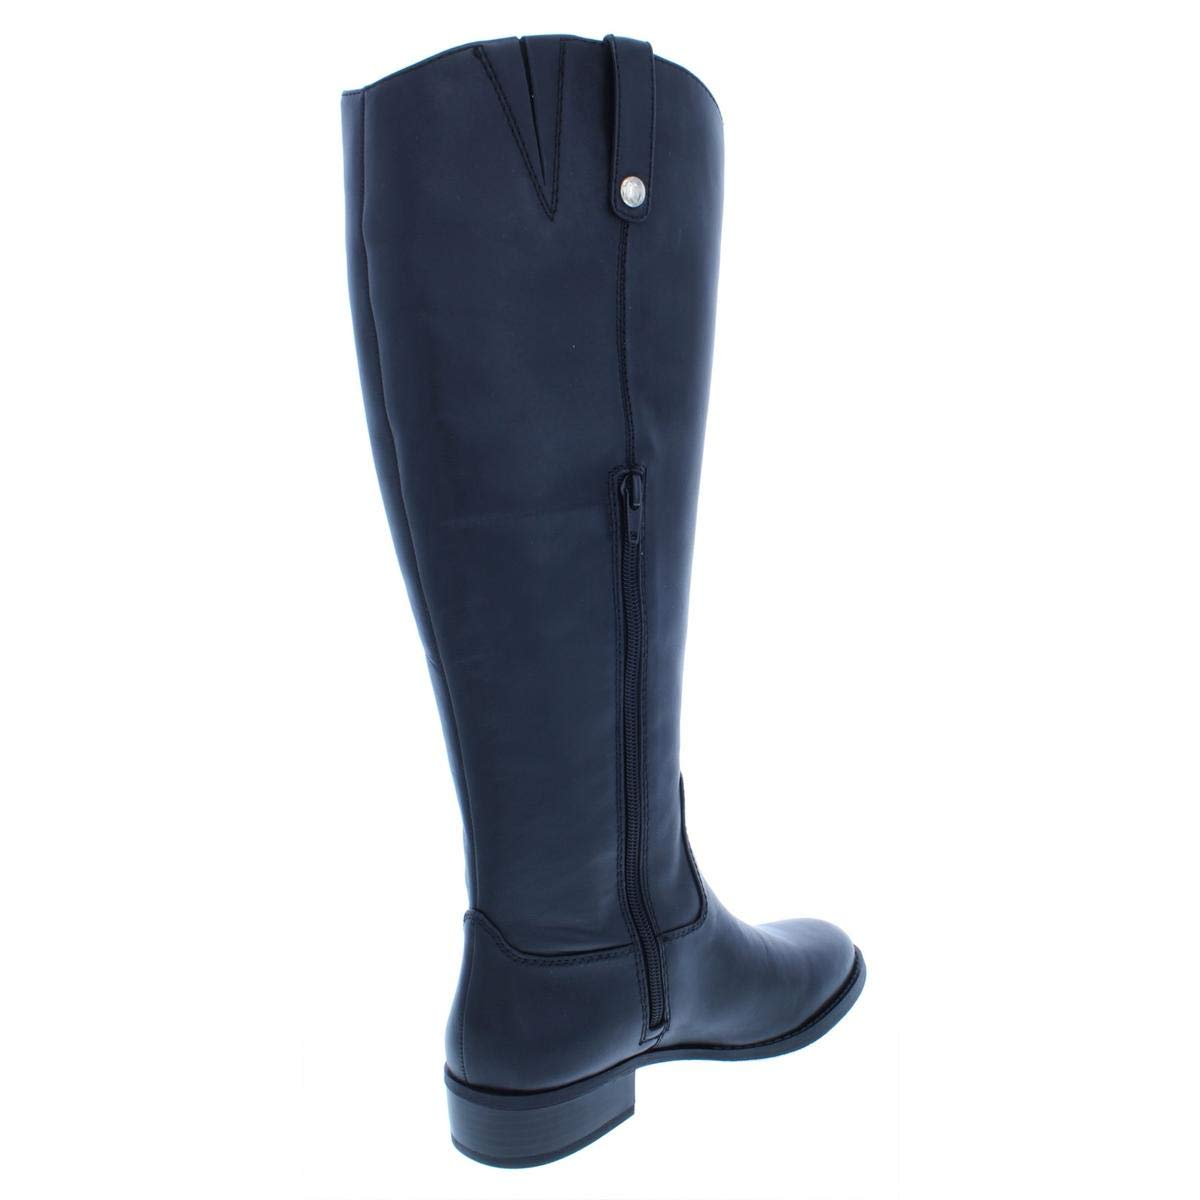 8953870fd9e Amazon.com | INC Womens Fawne Wide Calf Leather Riding Boots Black ...